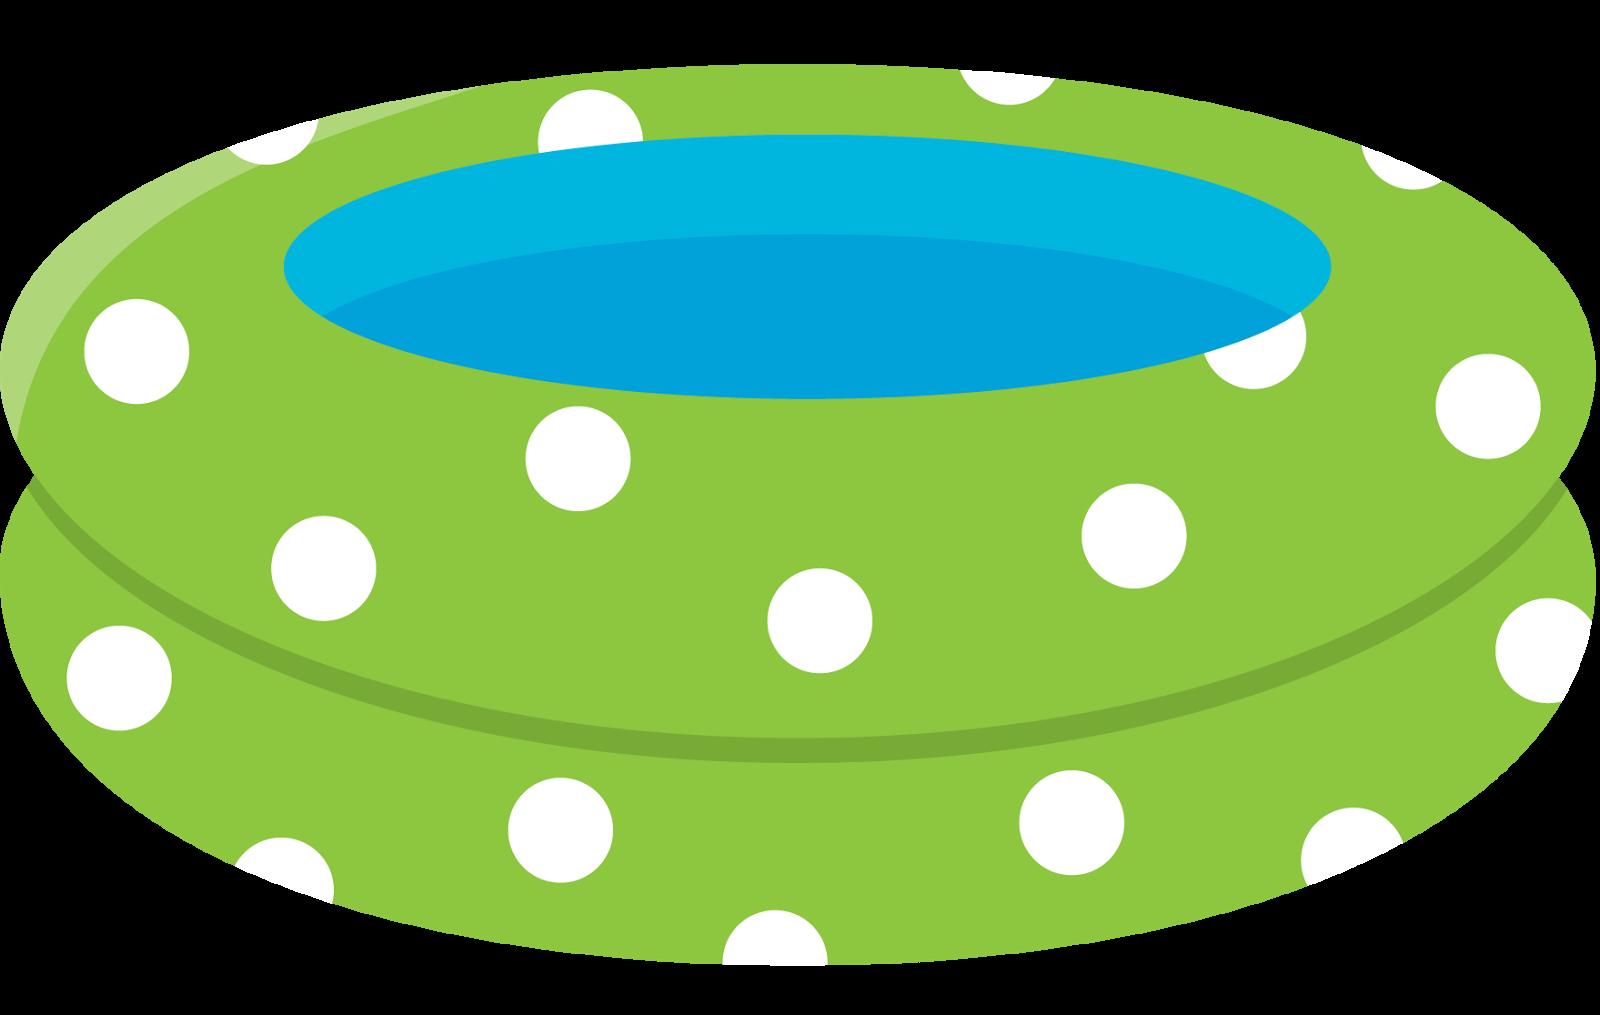 House clipart pool. Jokingart com swimming free